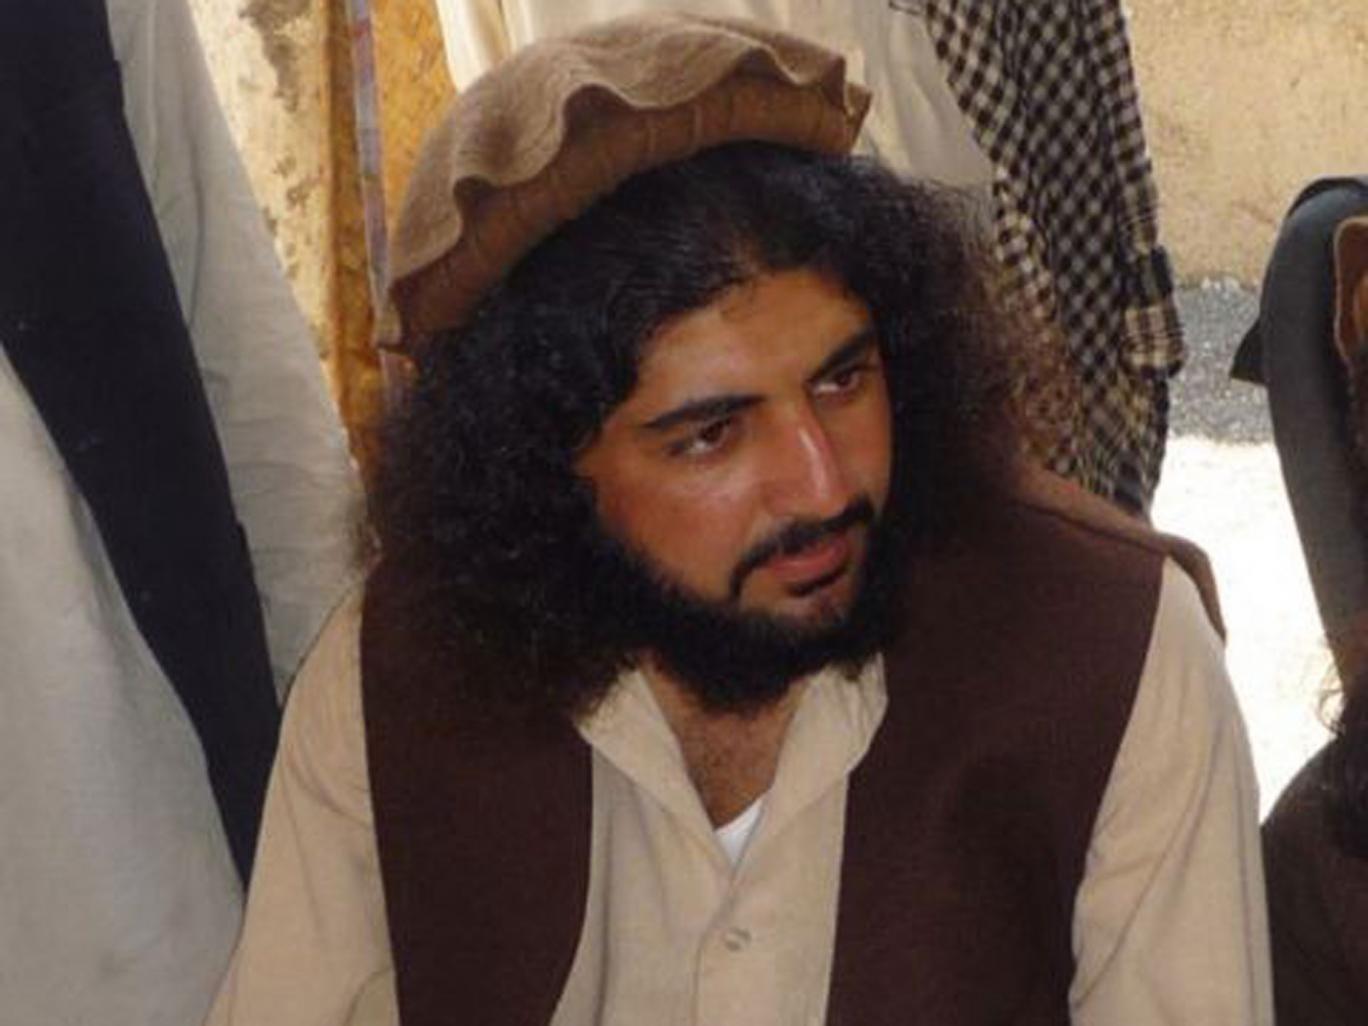 Pakistani Taliban commander Latif Mehsud was captured last weekend